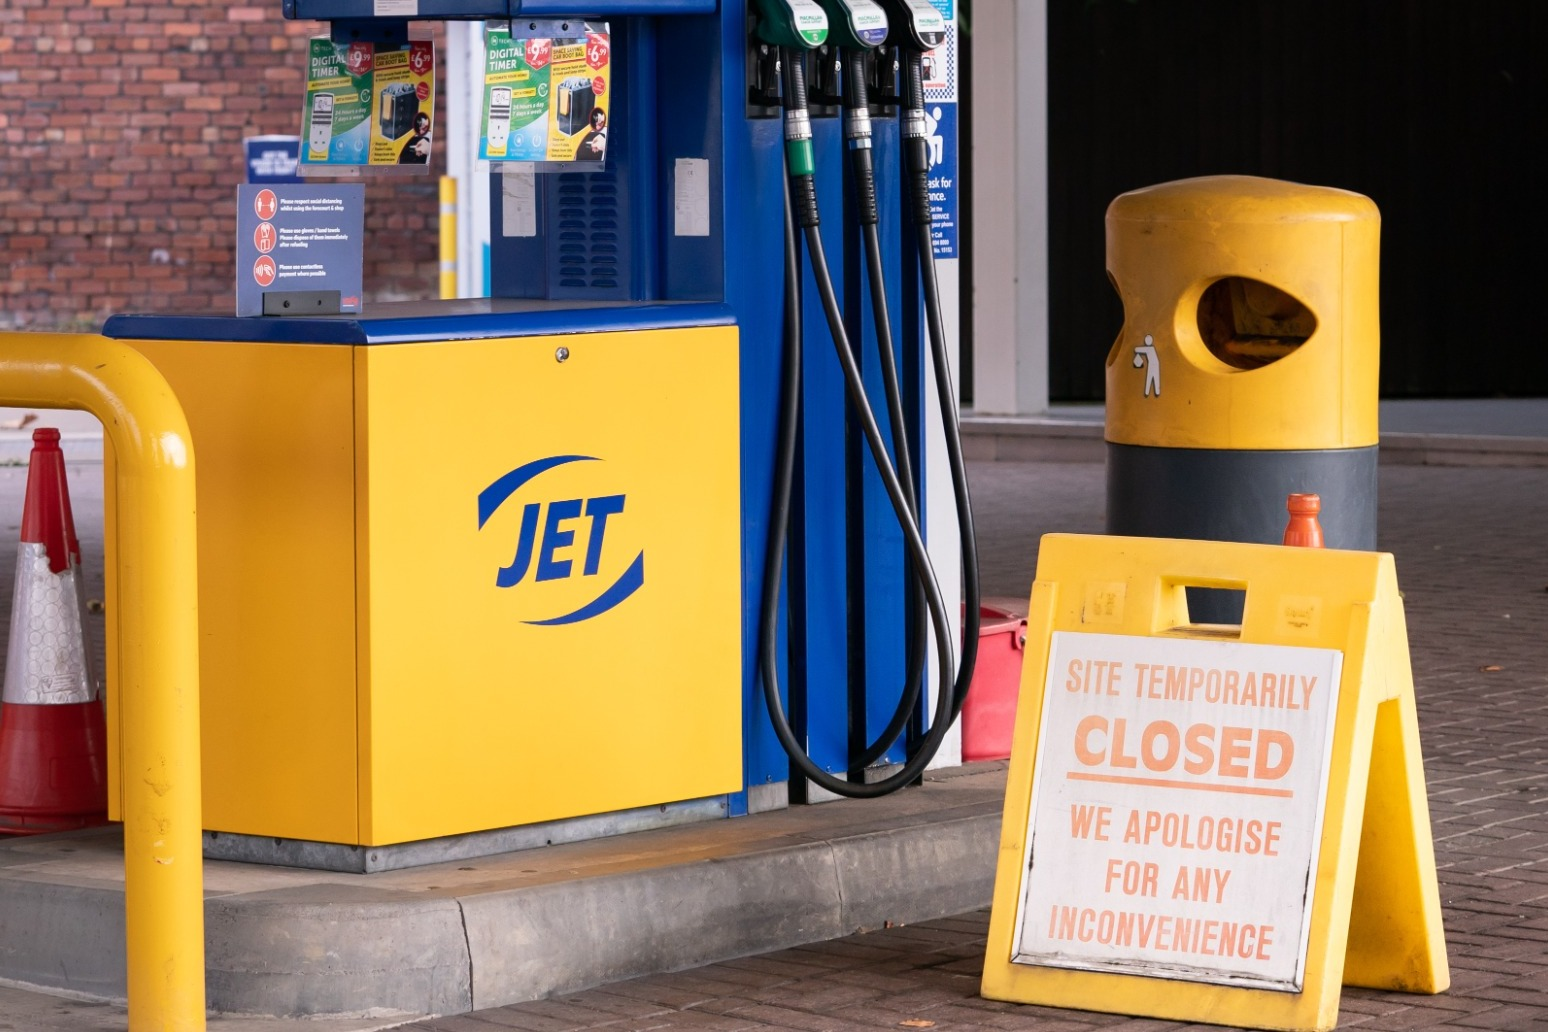 Boris Johnson says crisis on petrol forecourts is 'stabilising'